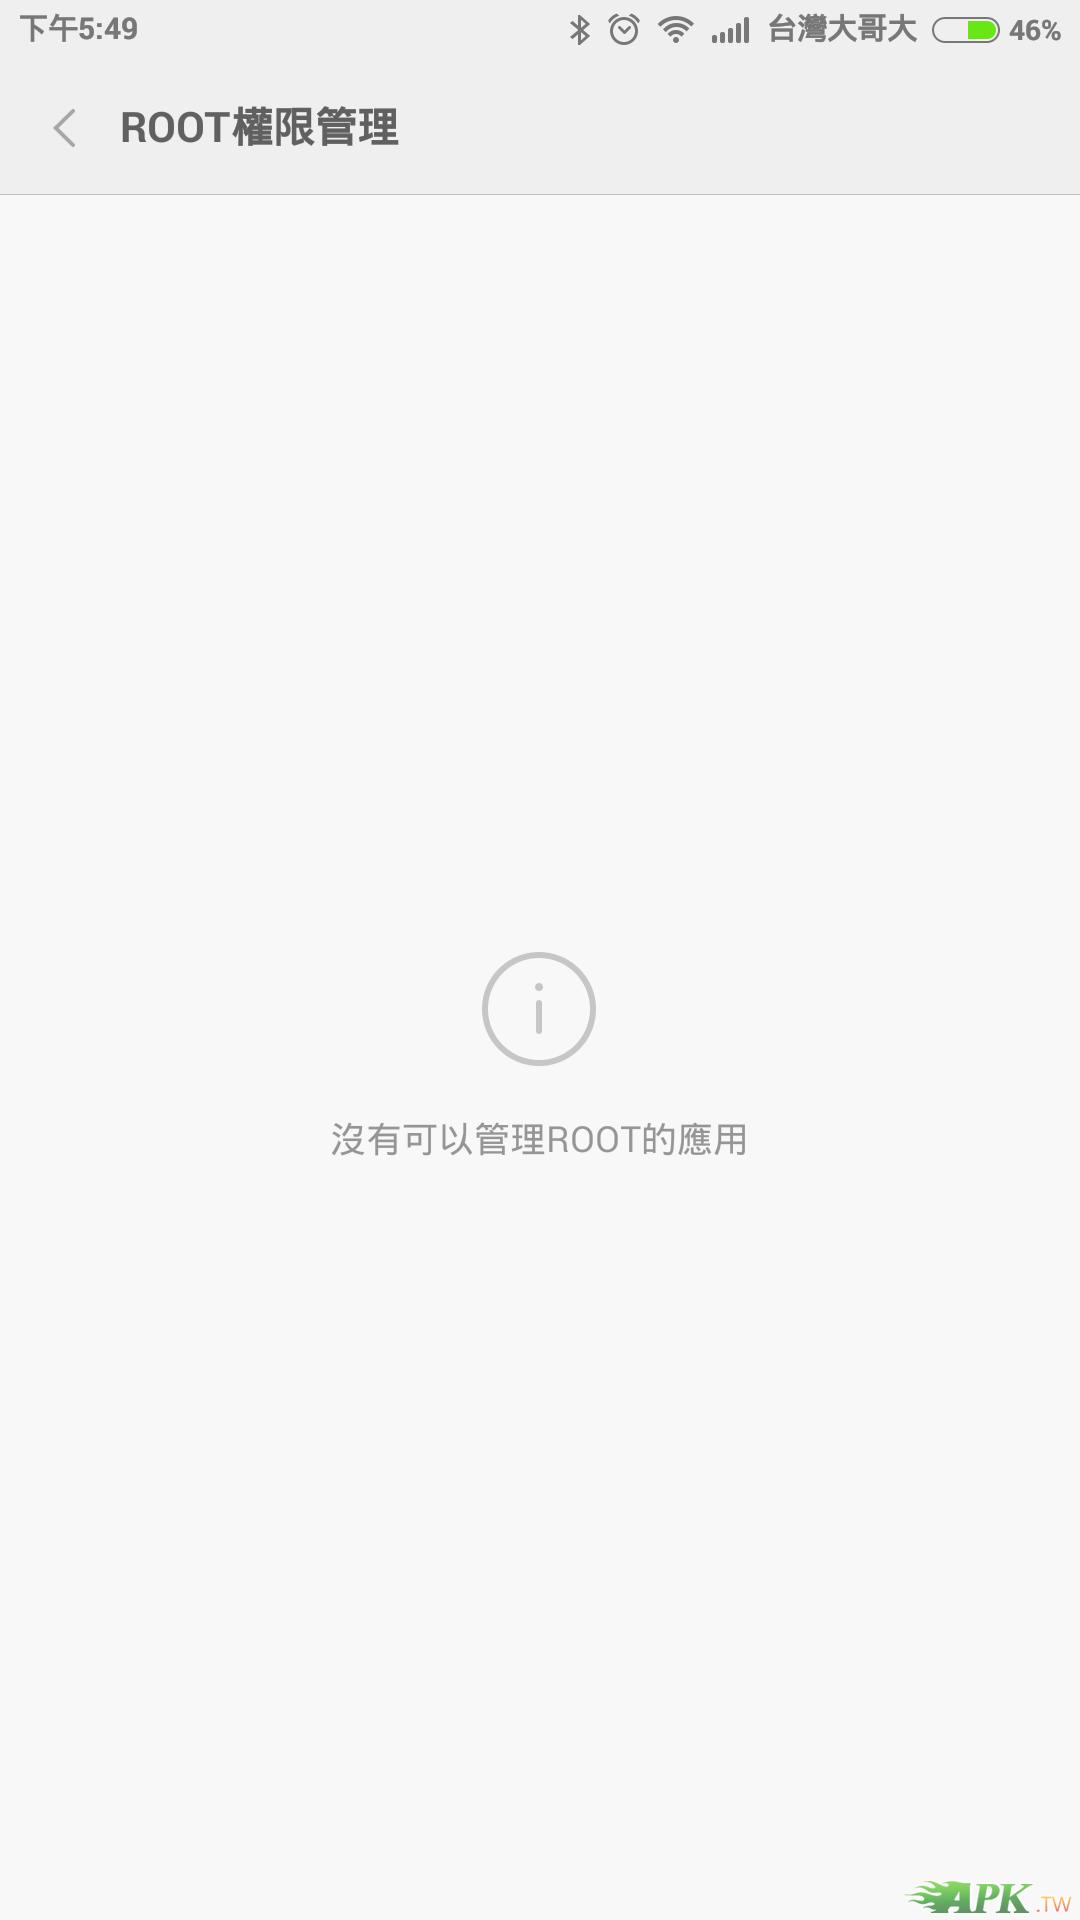 Screenshot_2015-04-16-17-49-09.png